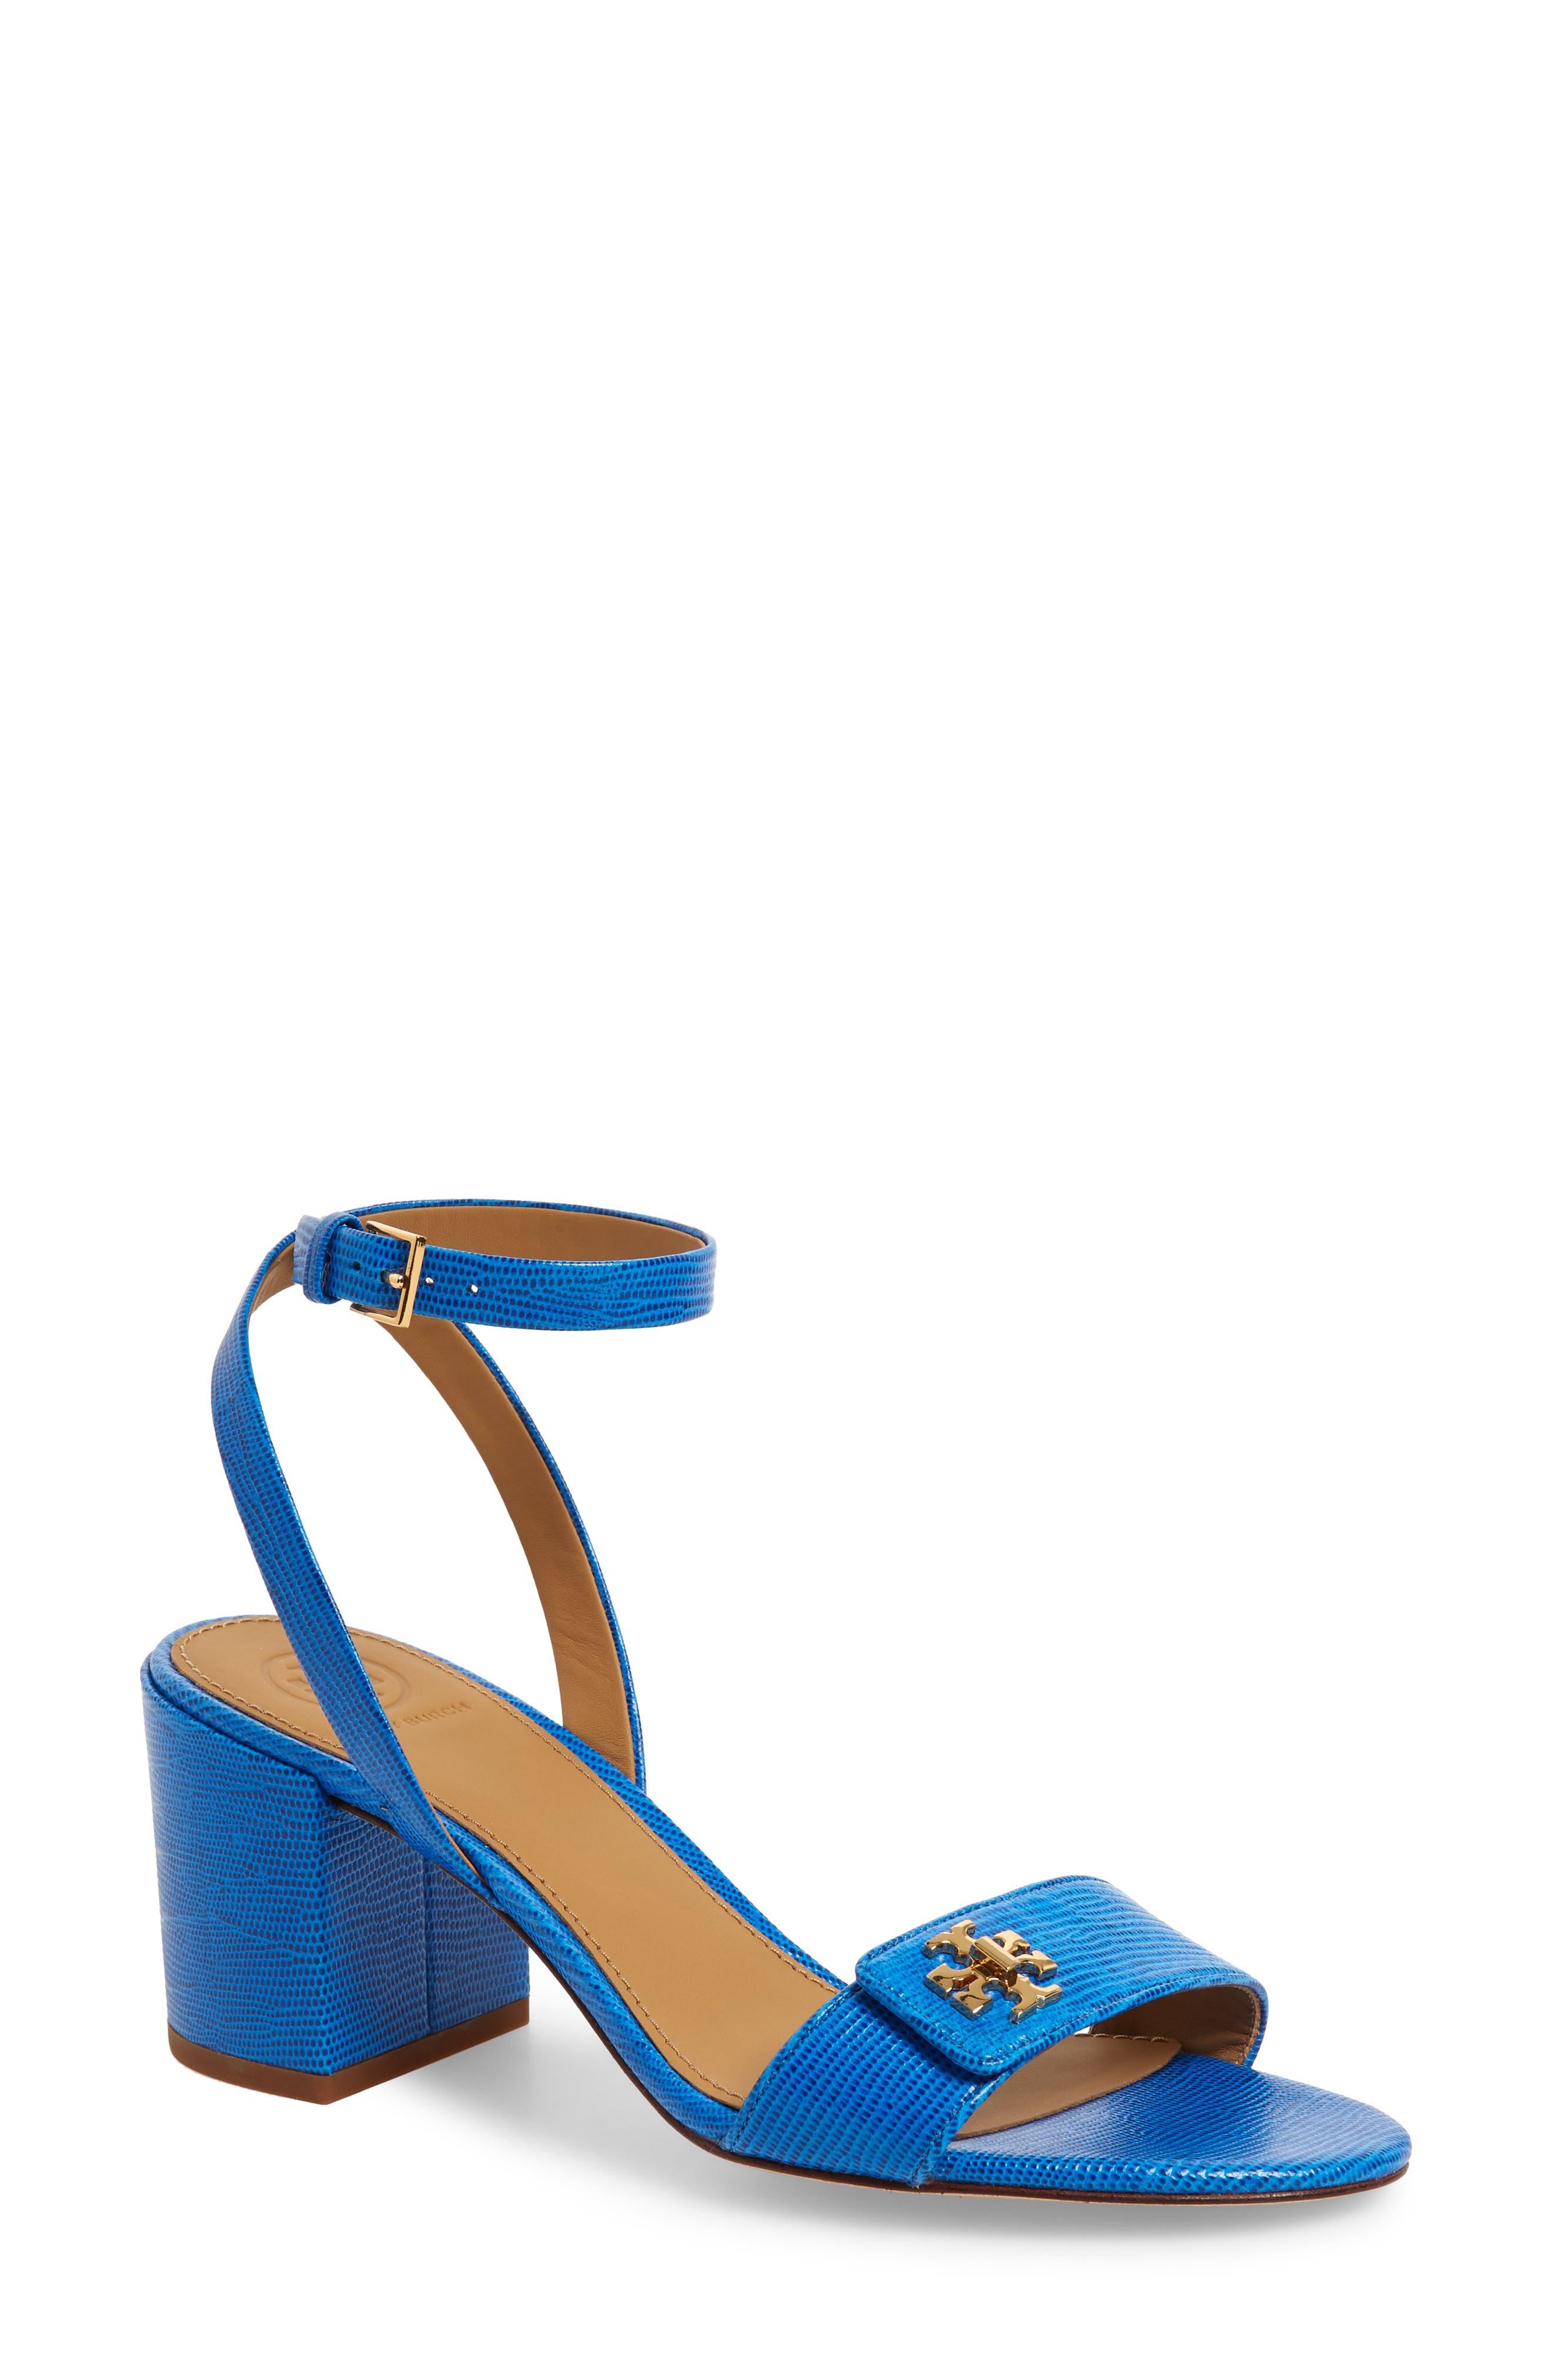 Tory Burch Kira Block Heel Sandal- Blue